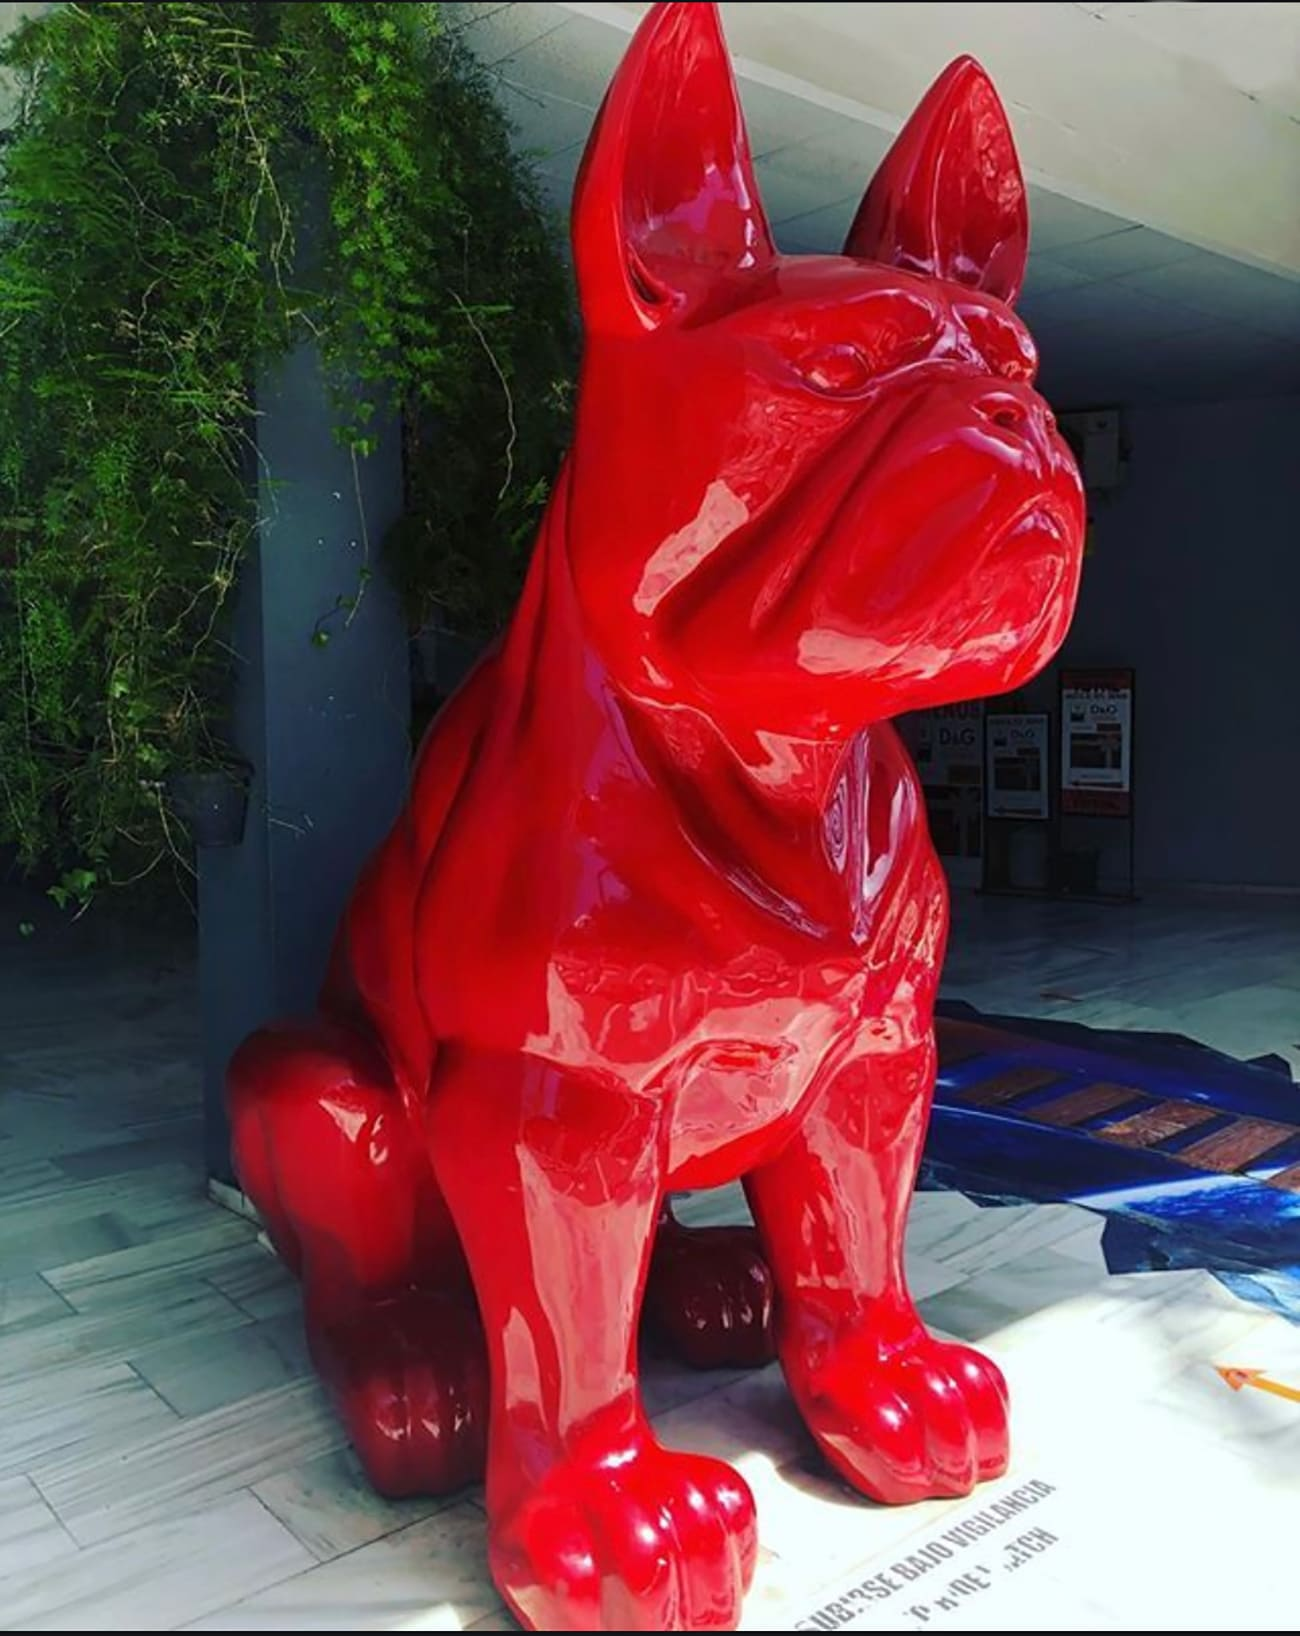 Red Dog - Puerto Banus